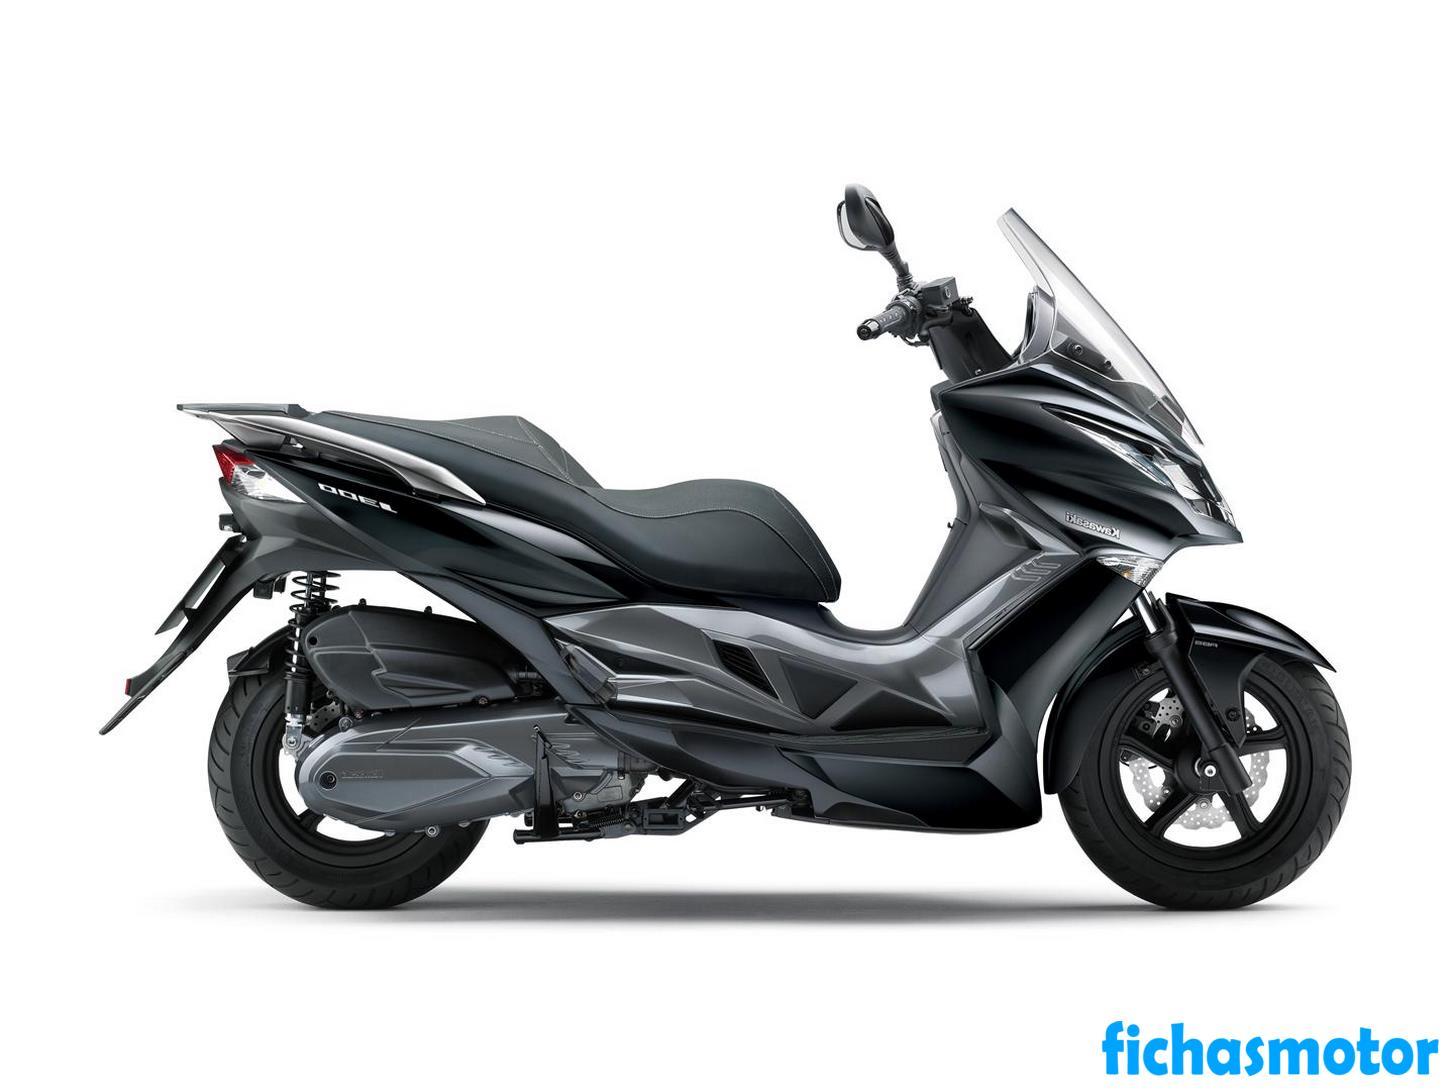 Imagen moto Kawasaki J300 año 2019